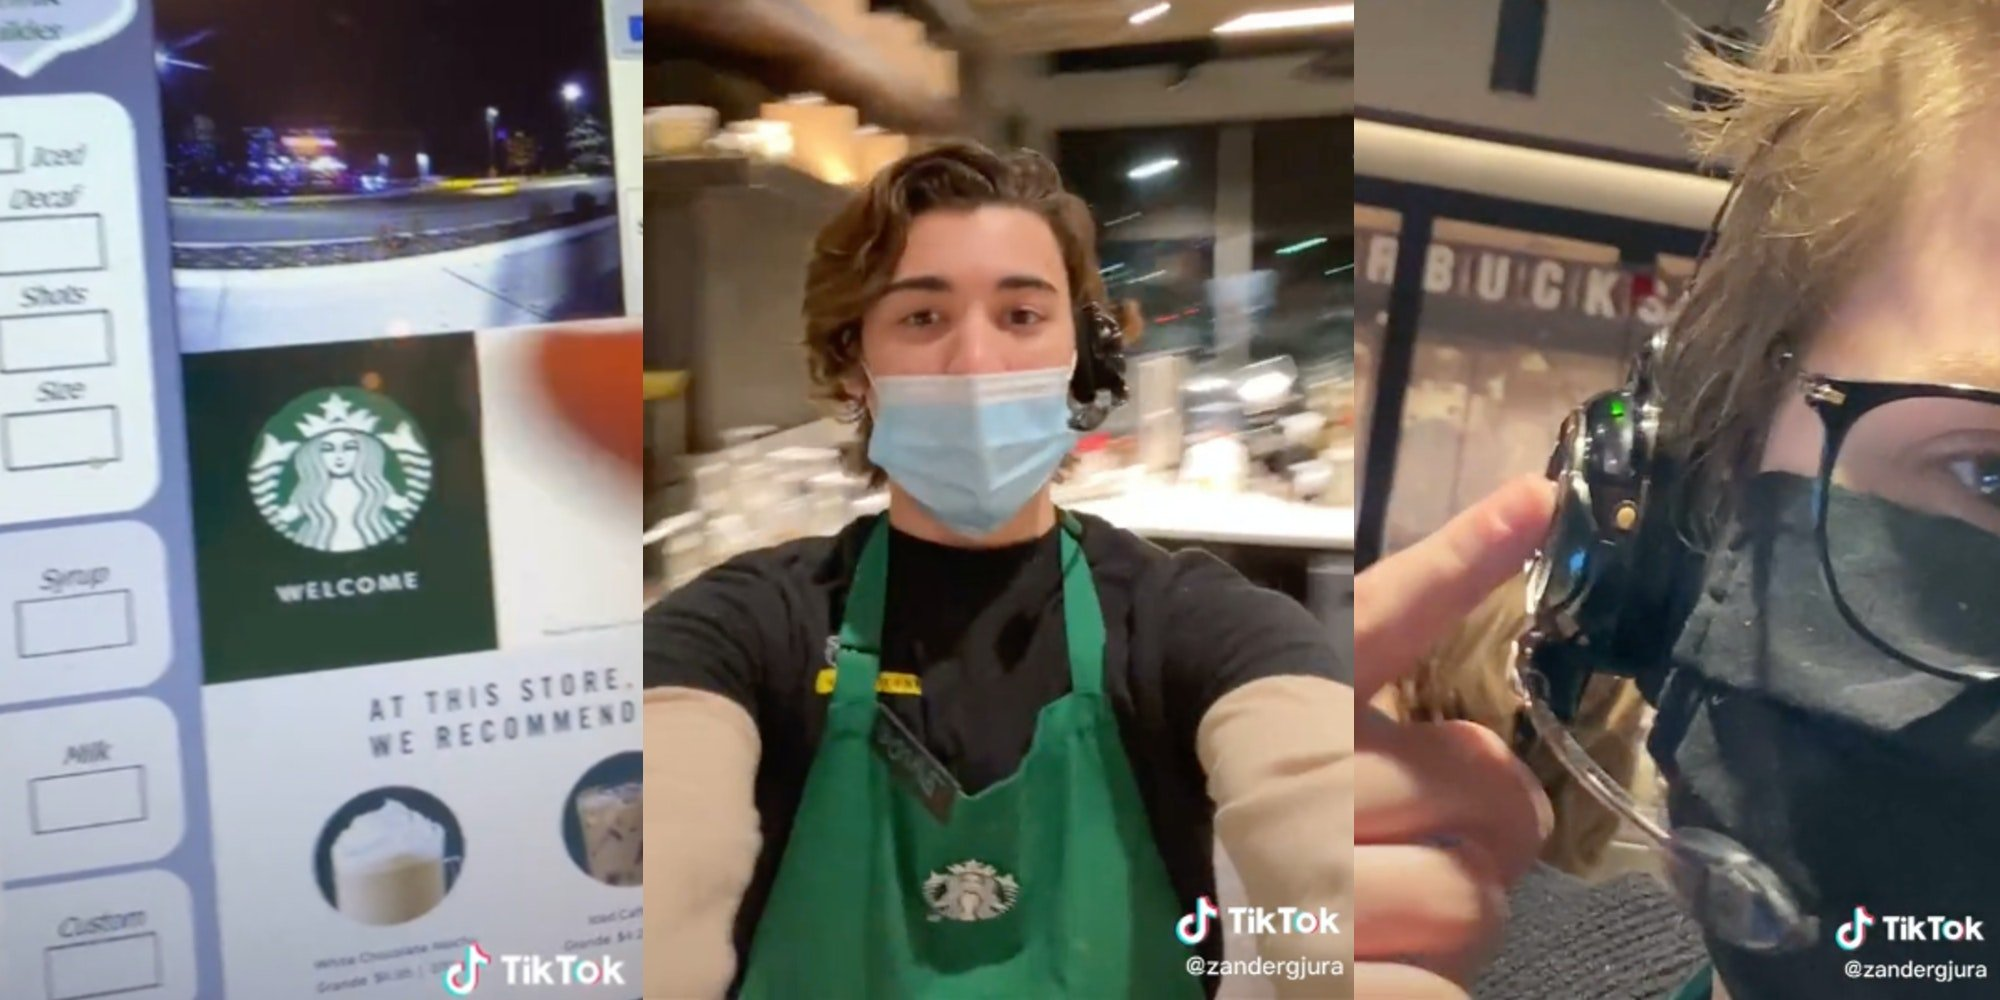 starbucks input ordering machine, a starbucks employee, and another starbucks employee pointing to headset